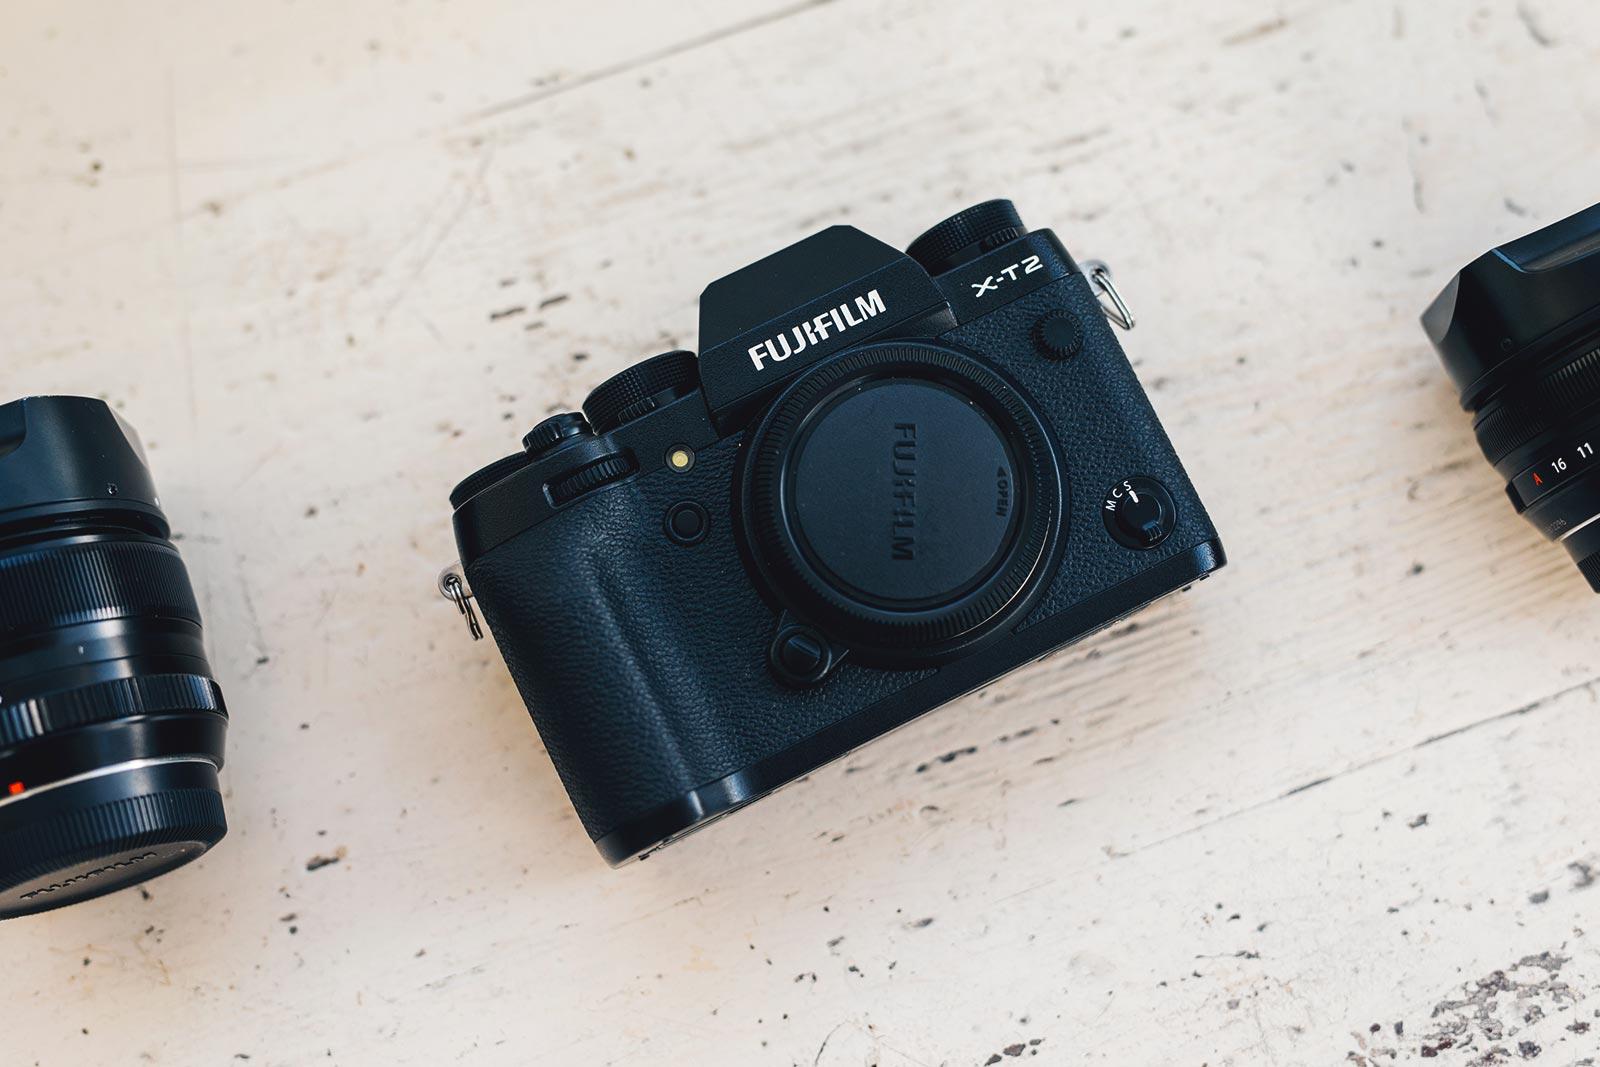 appareil photo fujifilm xt-2